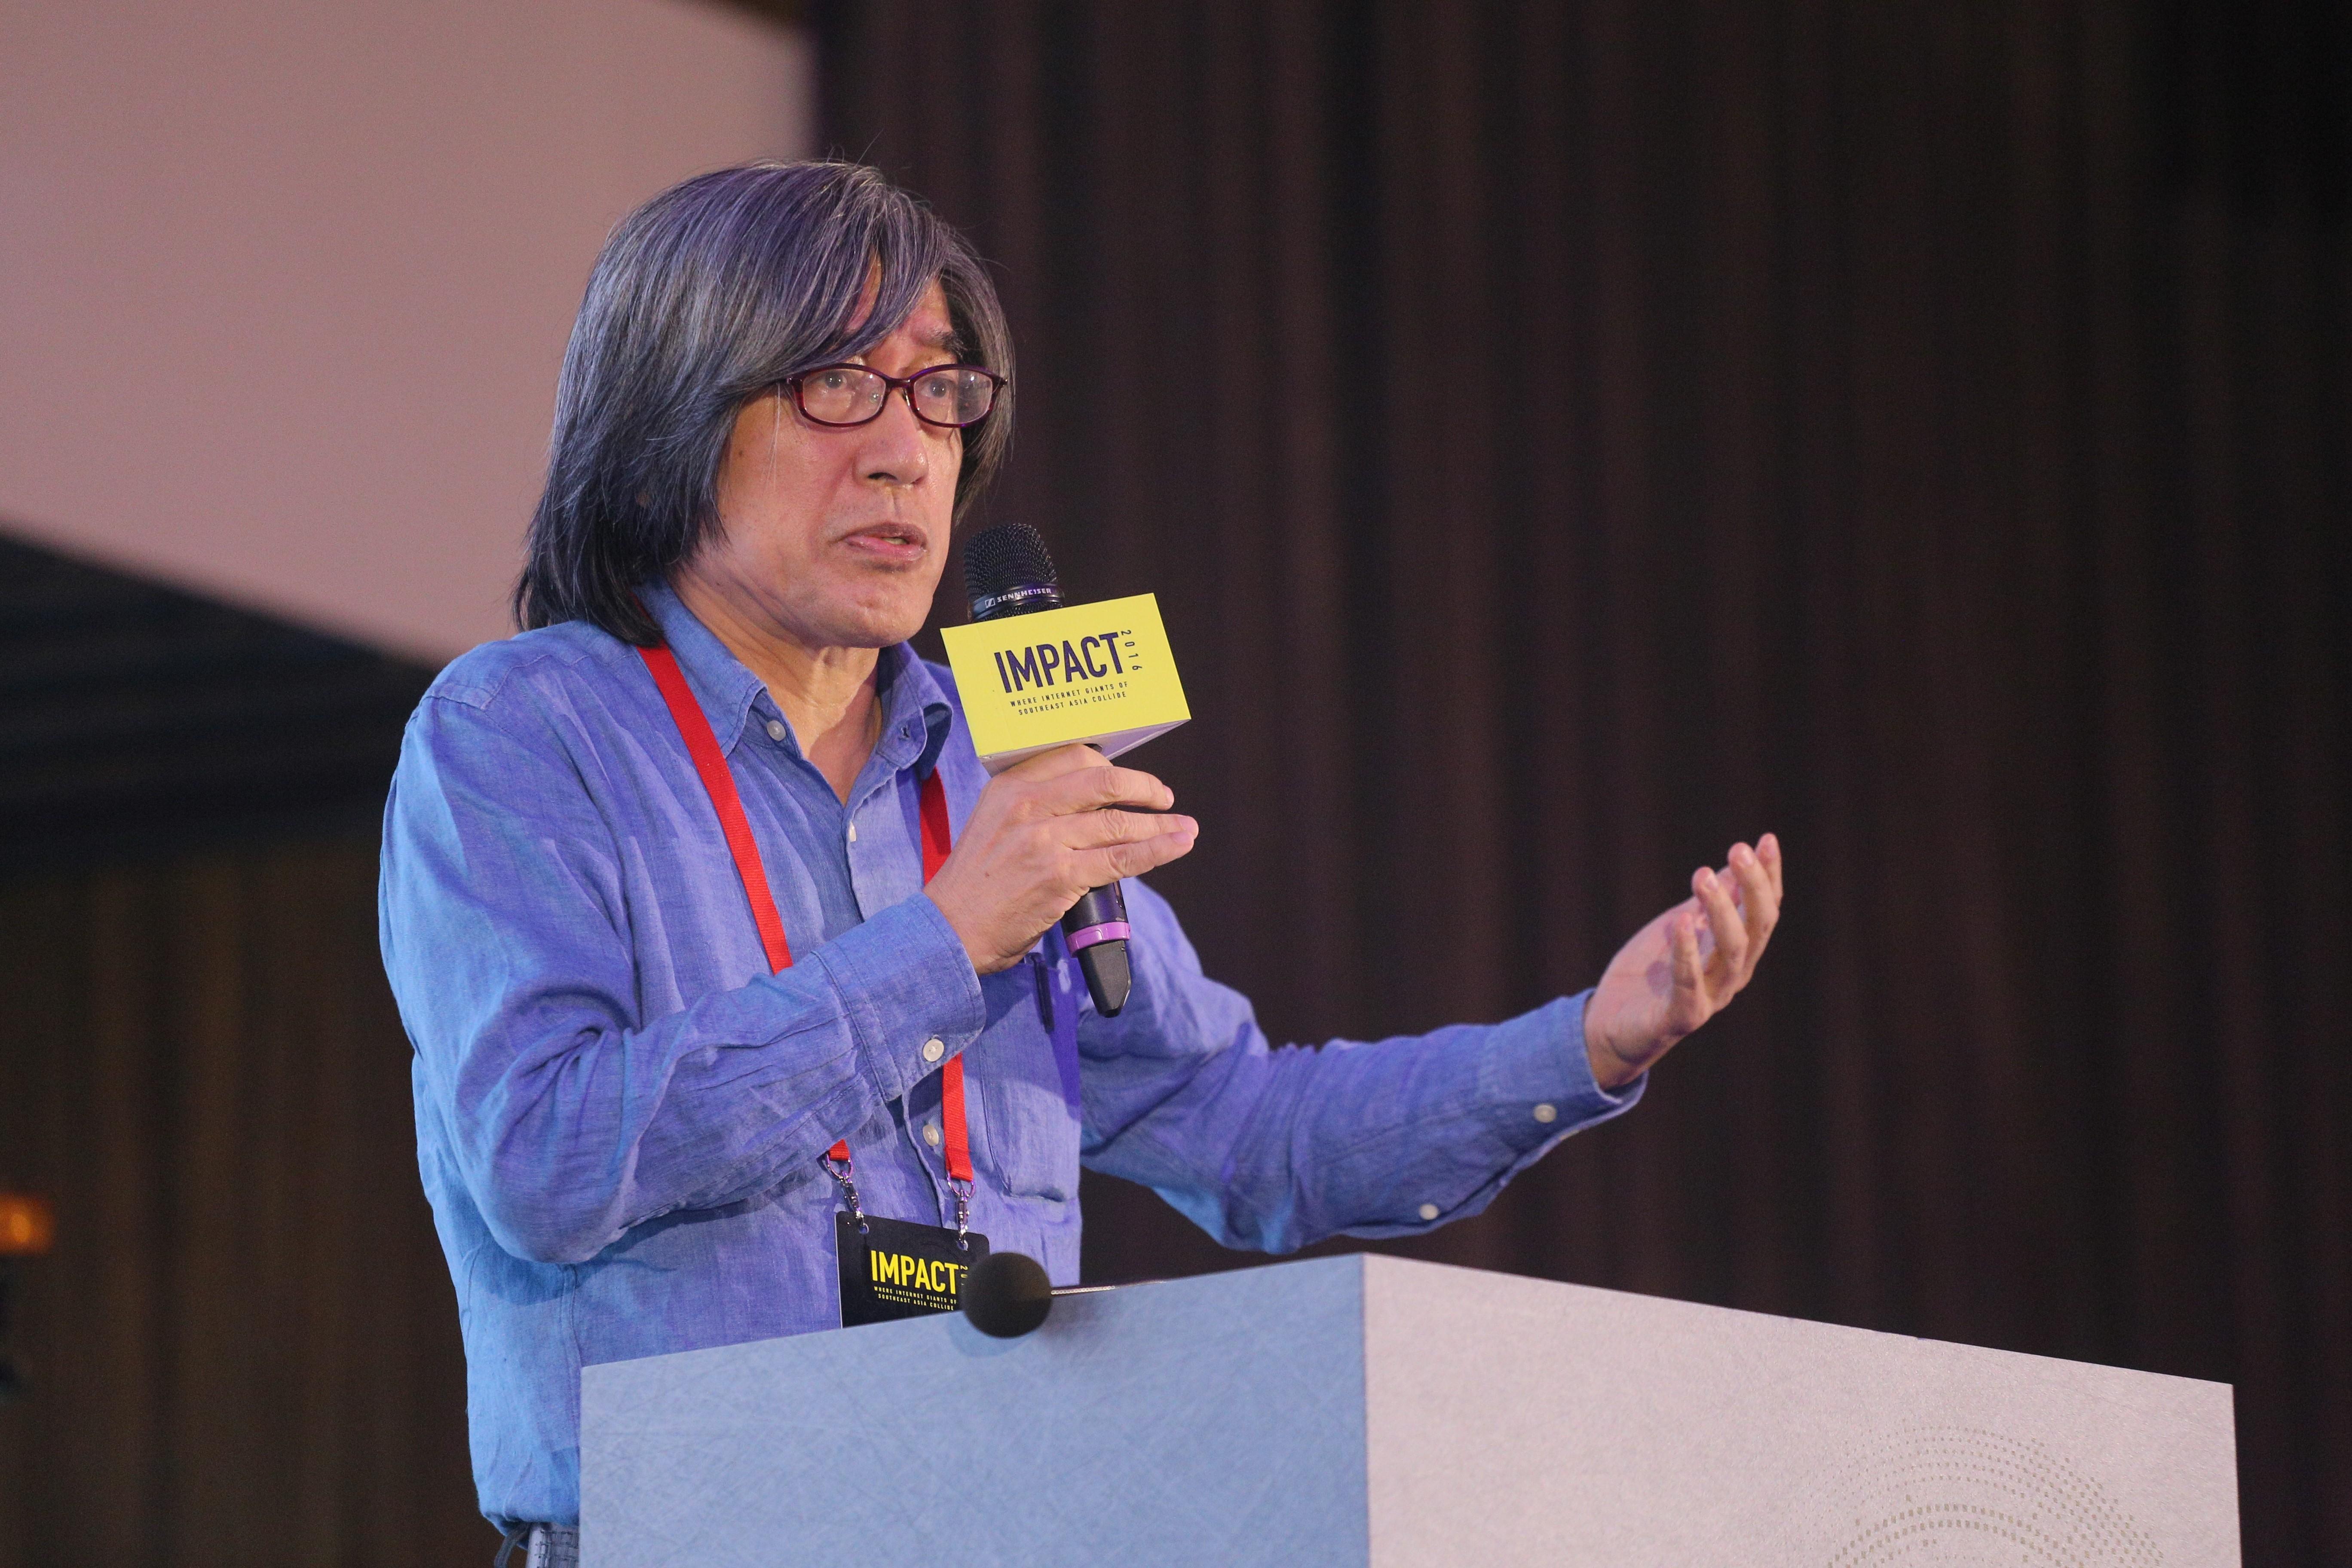 PChome Online 董事長詹宏志先生在演說中重新檢視 PChome Online 的發展歷程